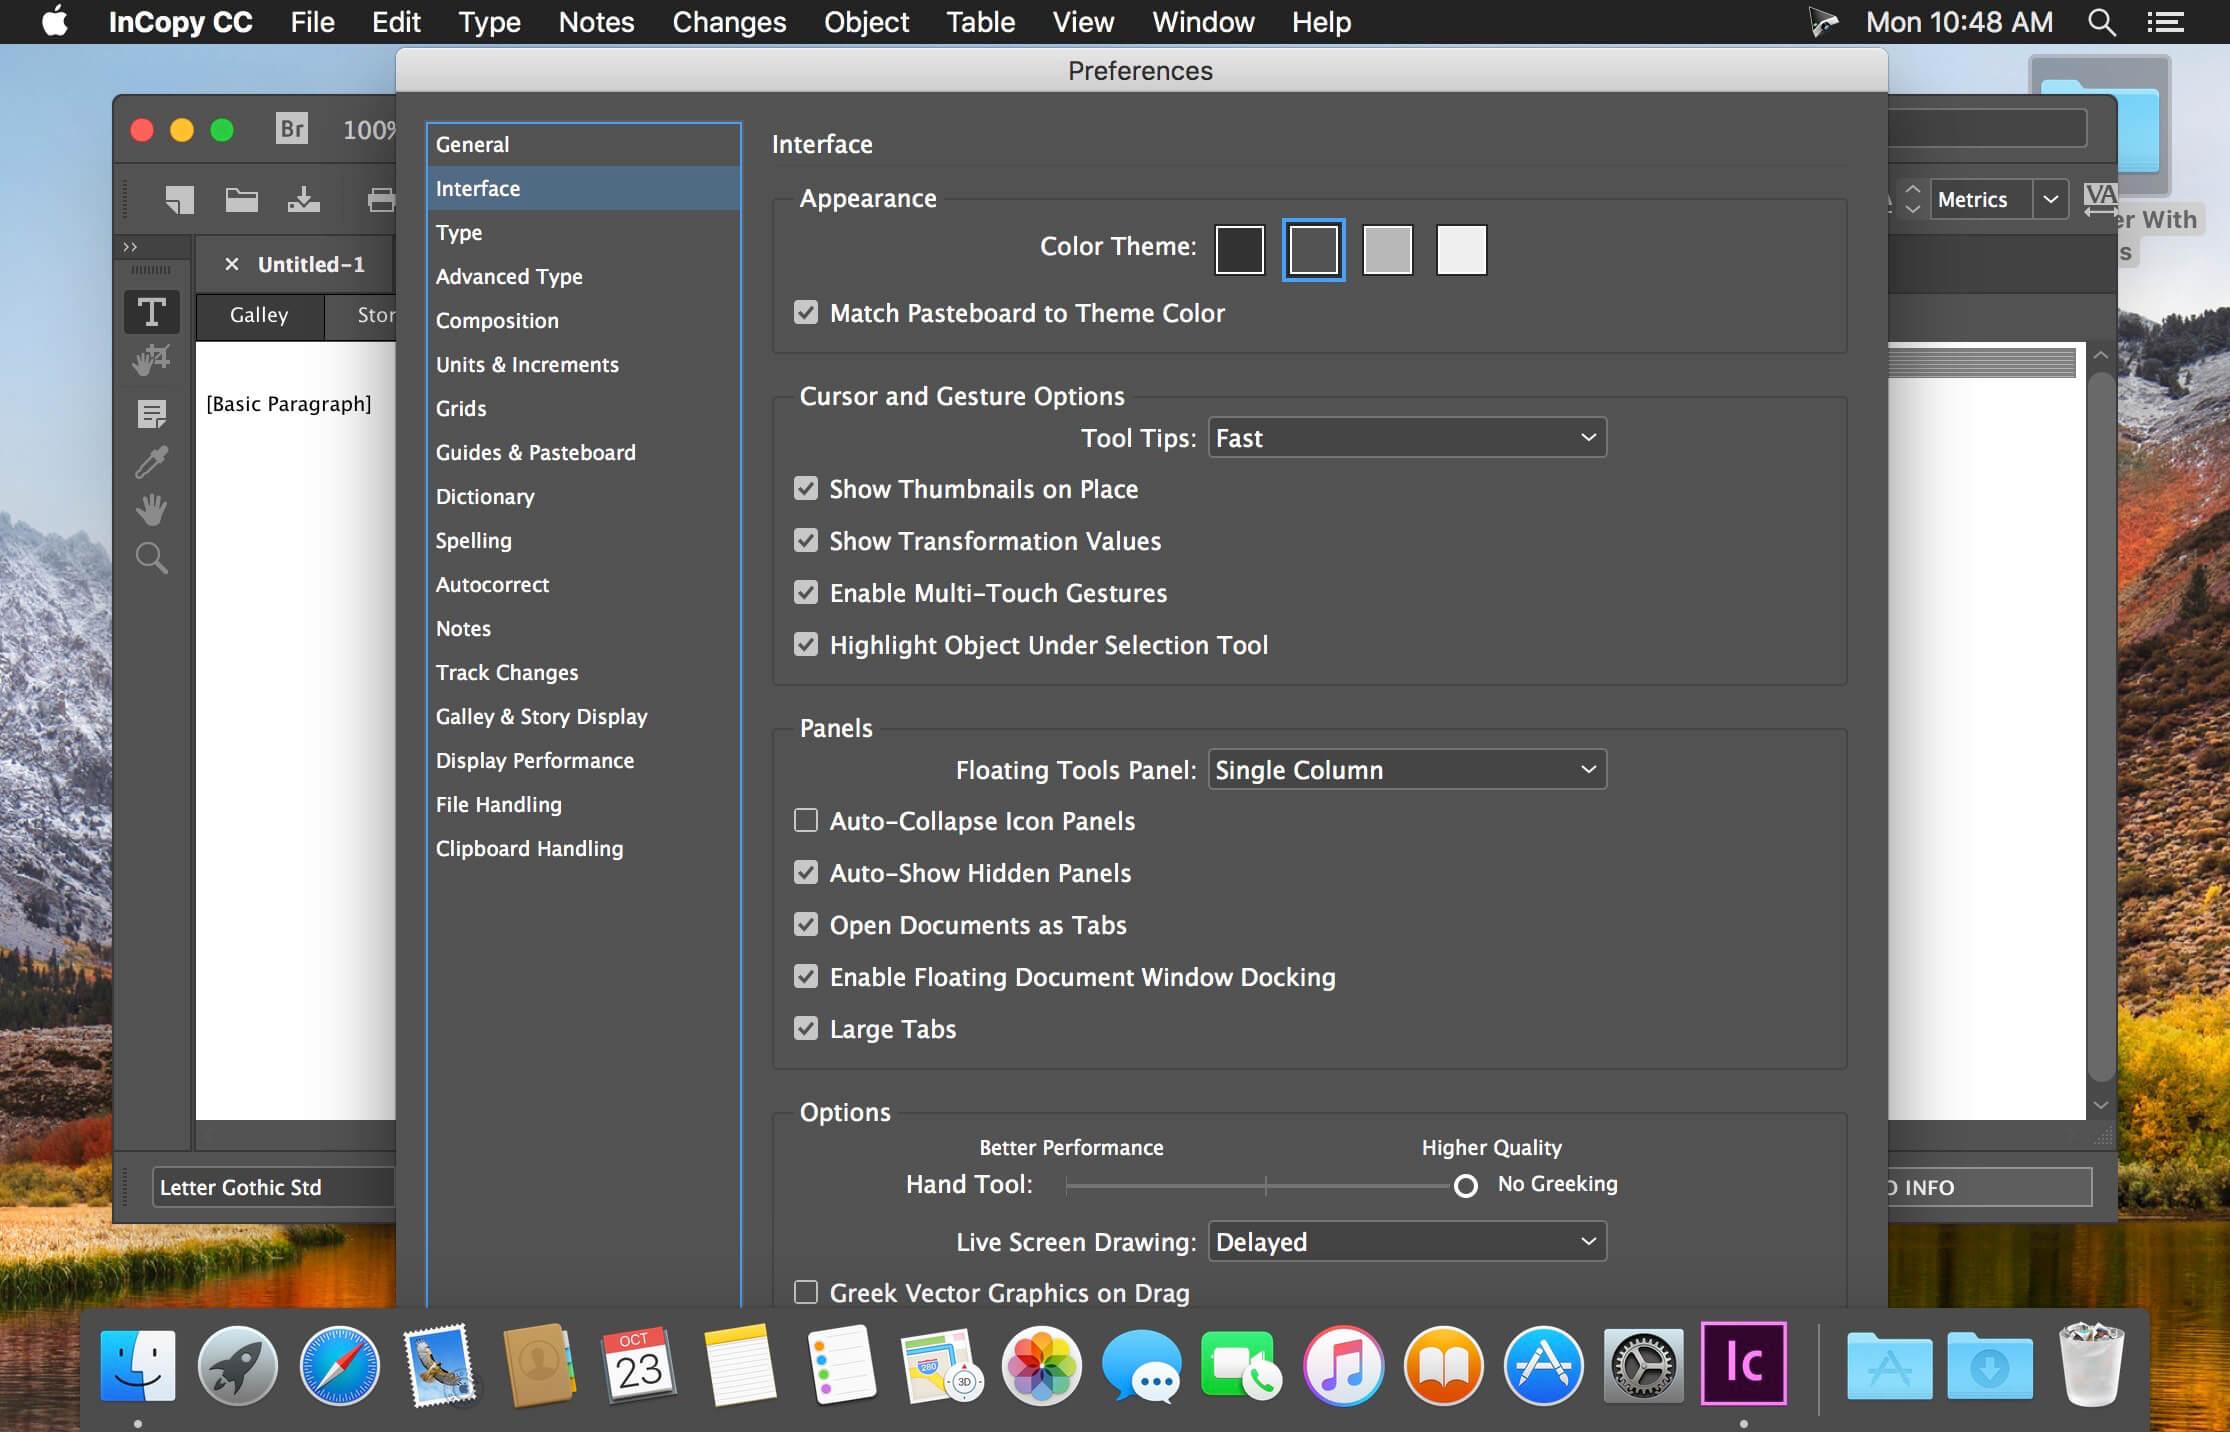 Adobe InCopy CC 2020 v15.0.2 Crack FREE Download – Mac Software ...